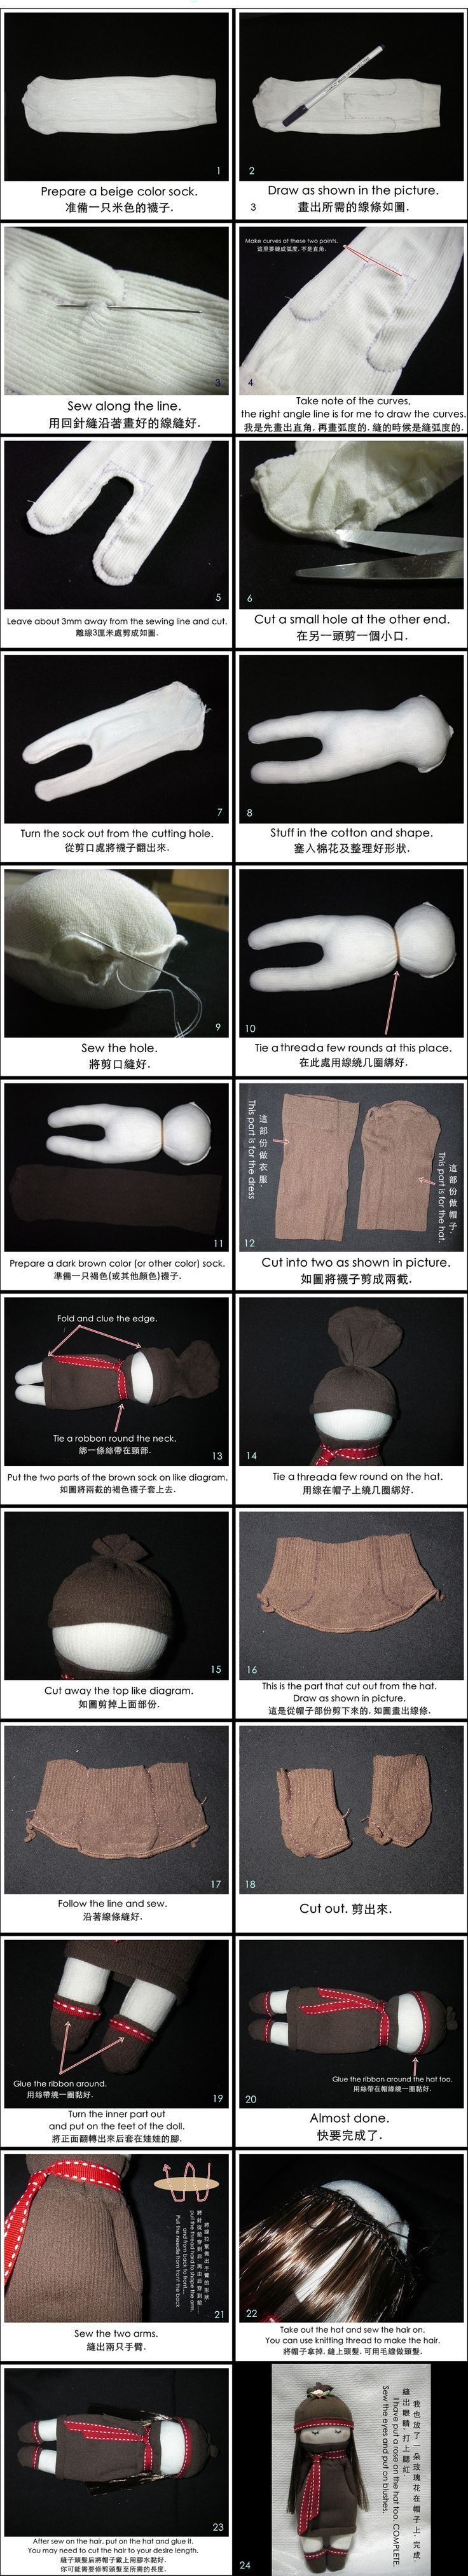 http://how-to-make-a-doll.com/wp-content/uploads/2012/01/tutorial32.jpg